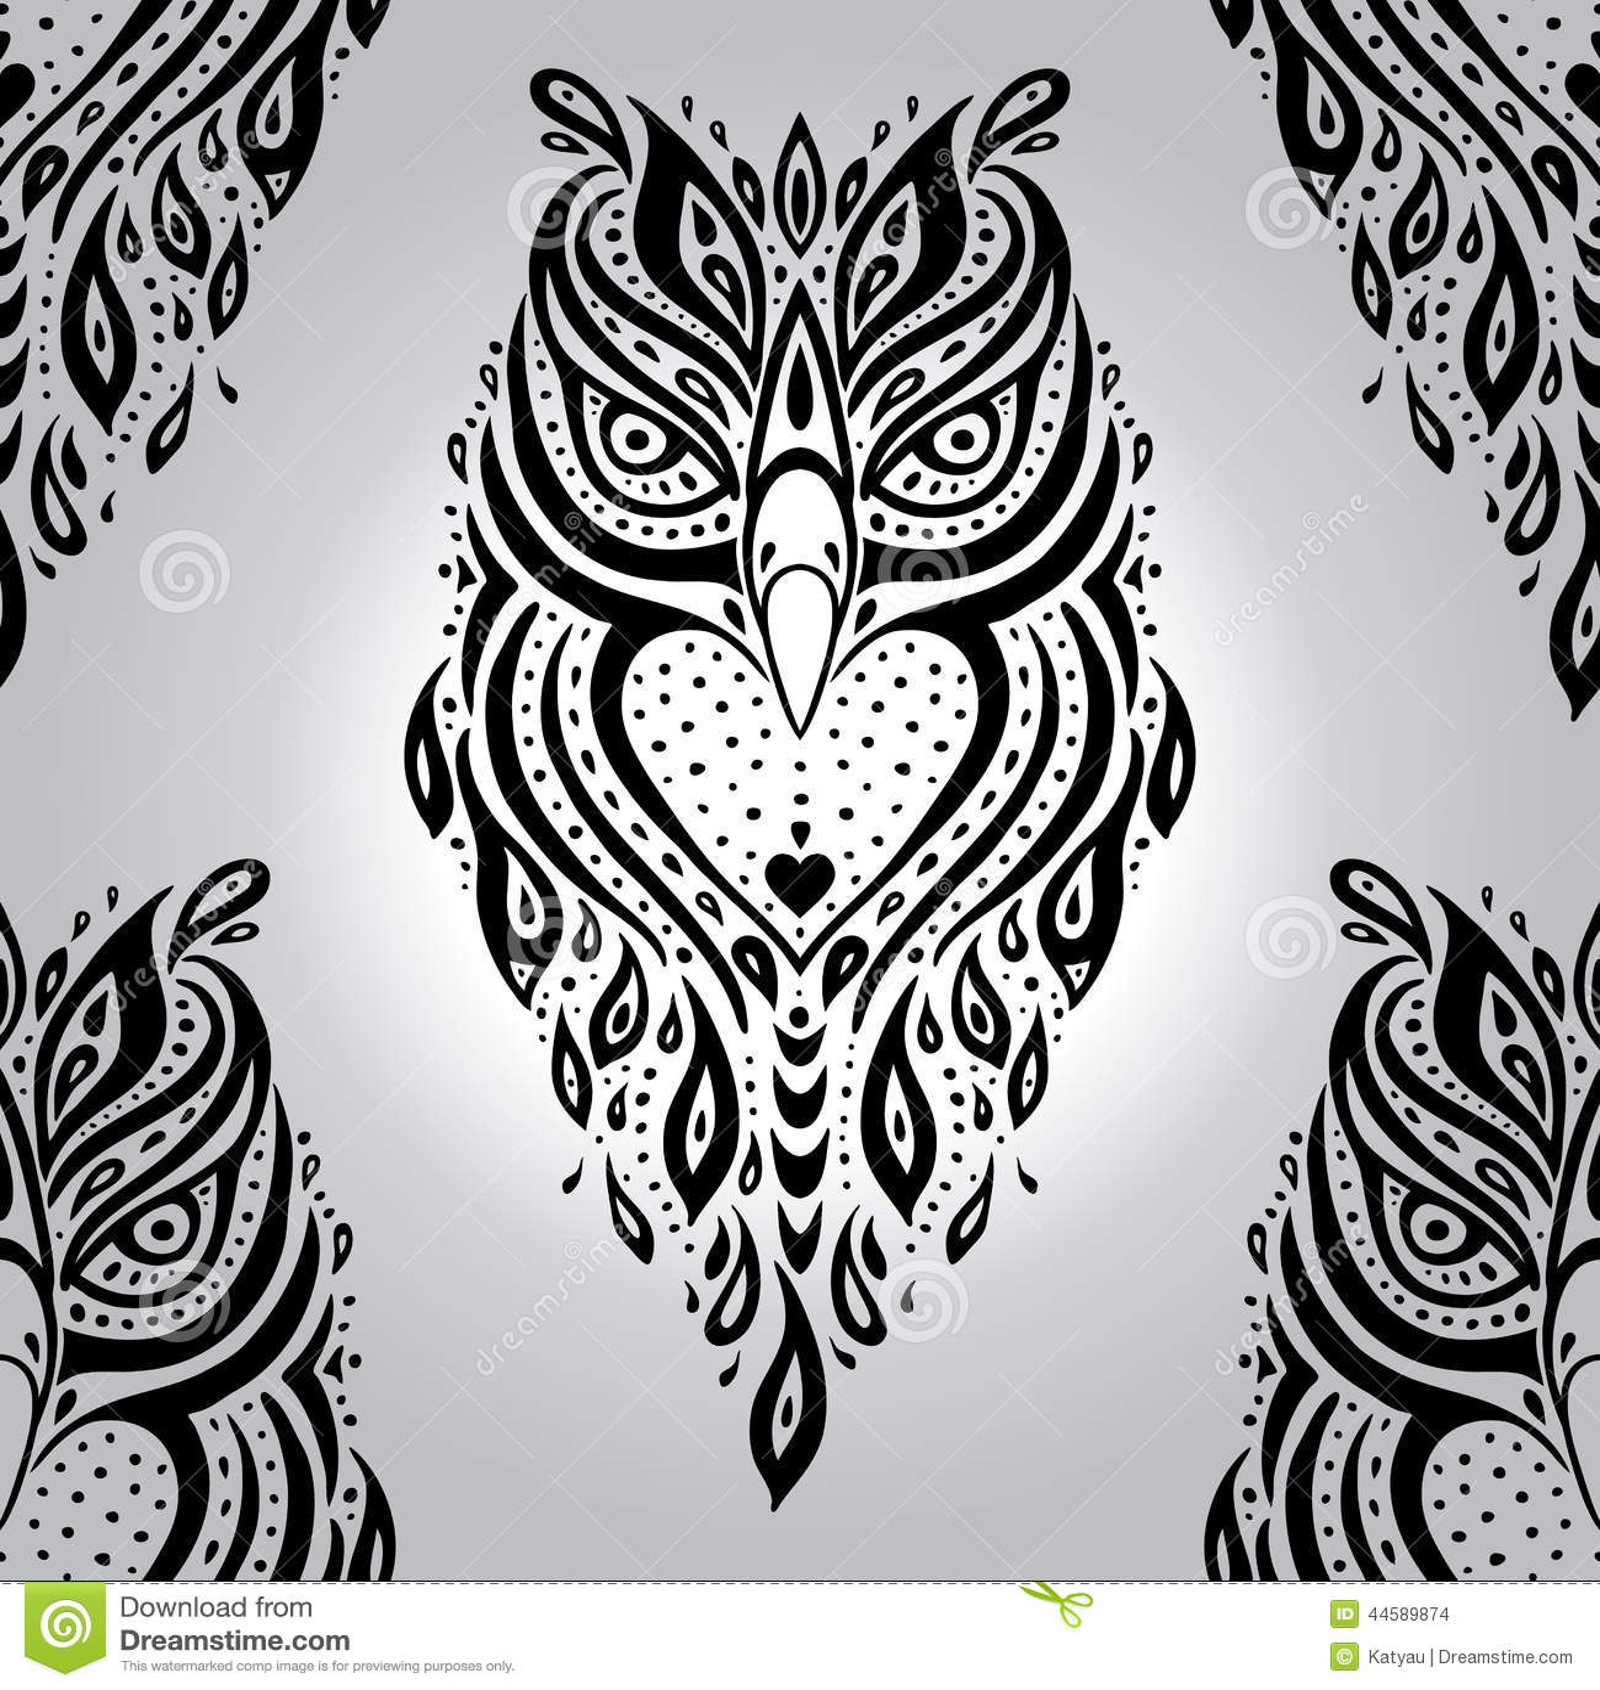 Decorative Owl Seamless Pattern Stock Vector Illustration Of